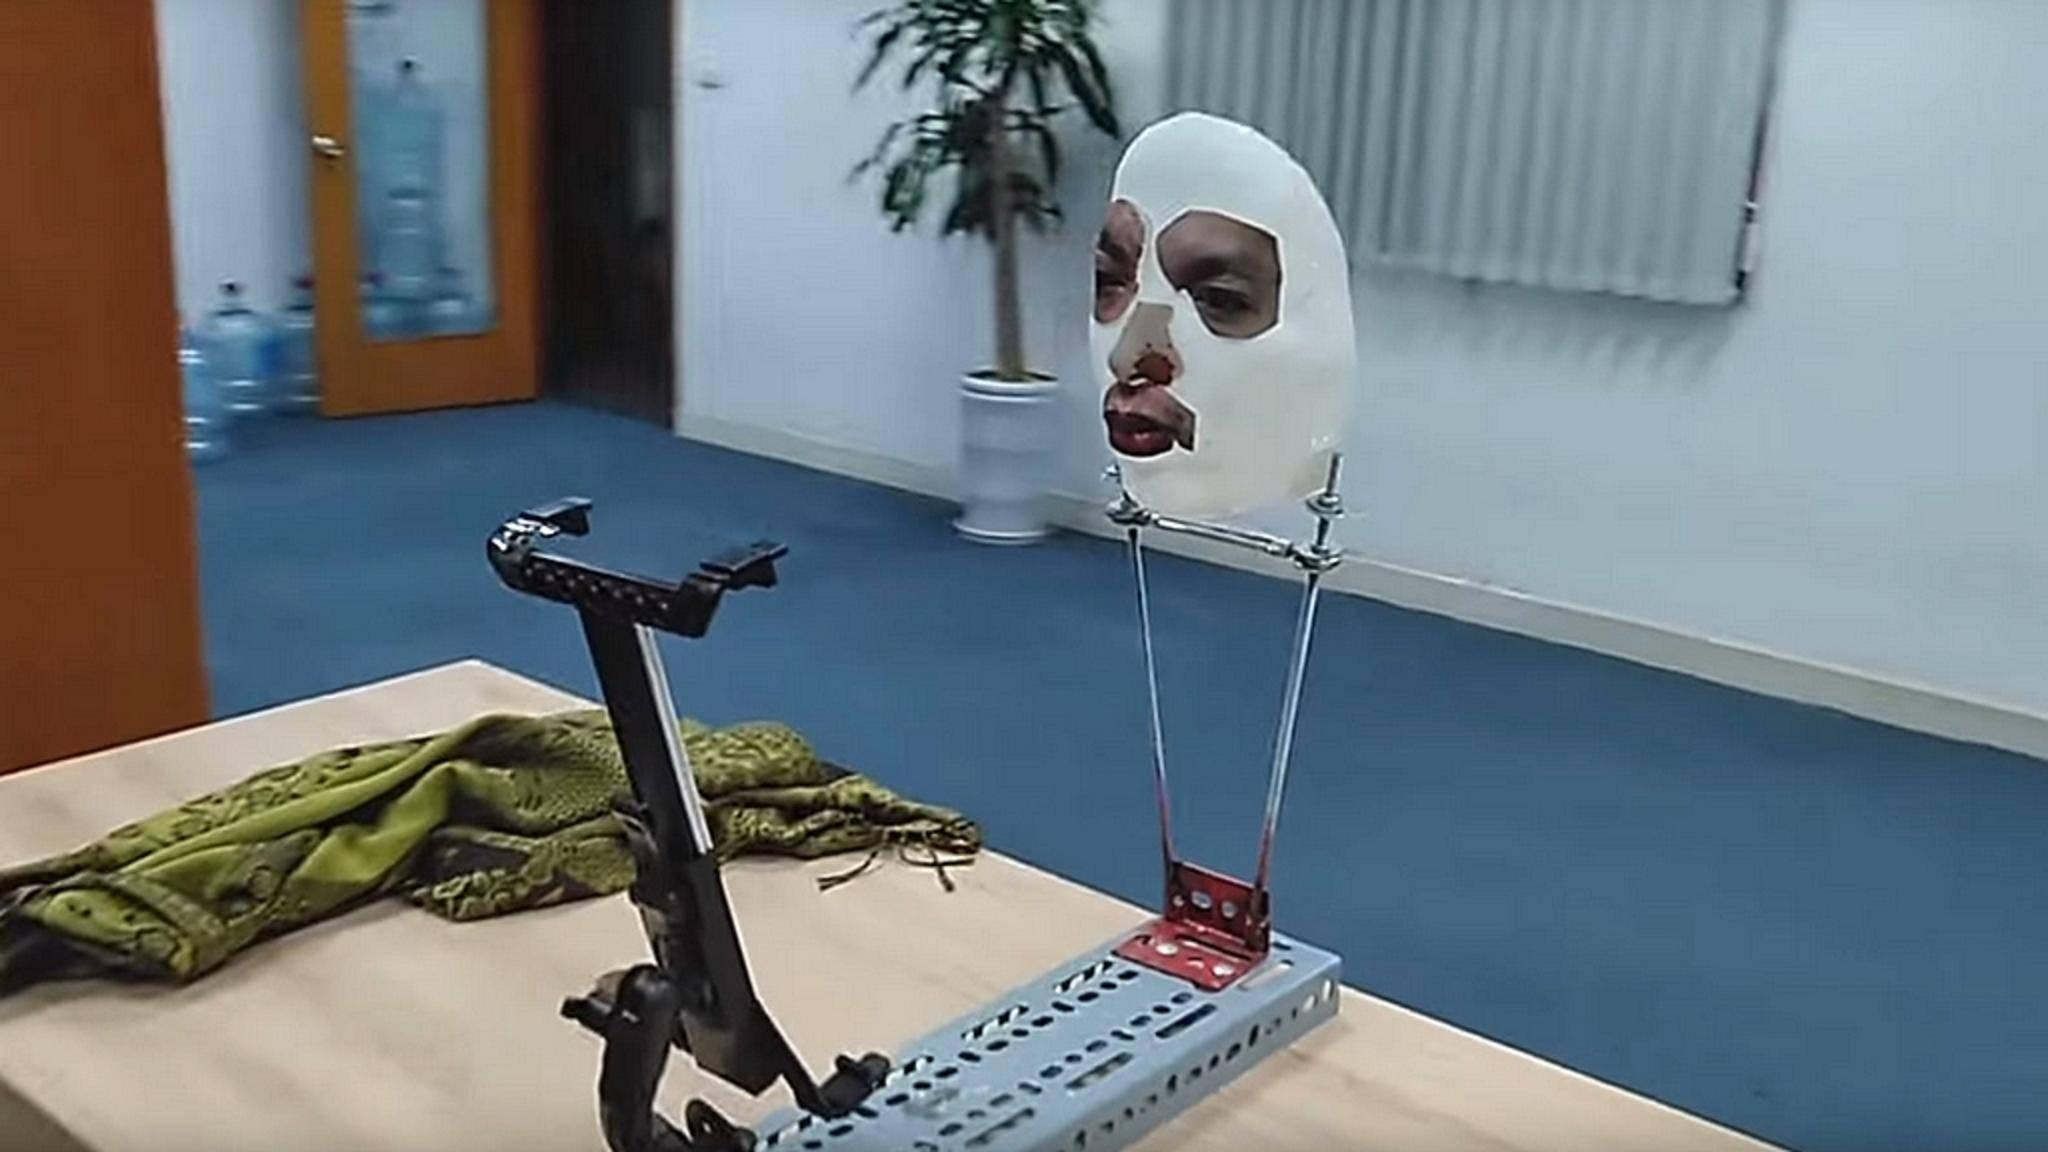 IPhone X Face ID: Kuriose Maske soll Gesichtserkennung geknackt haben